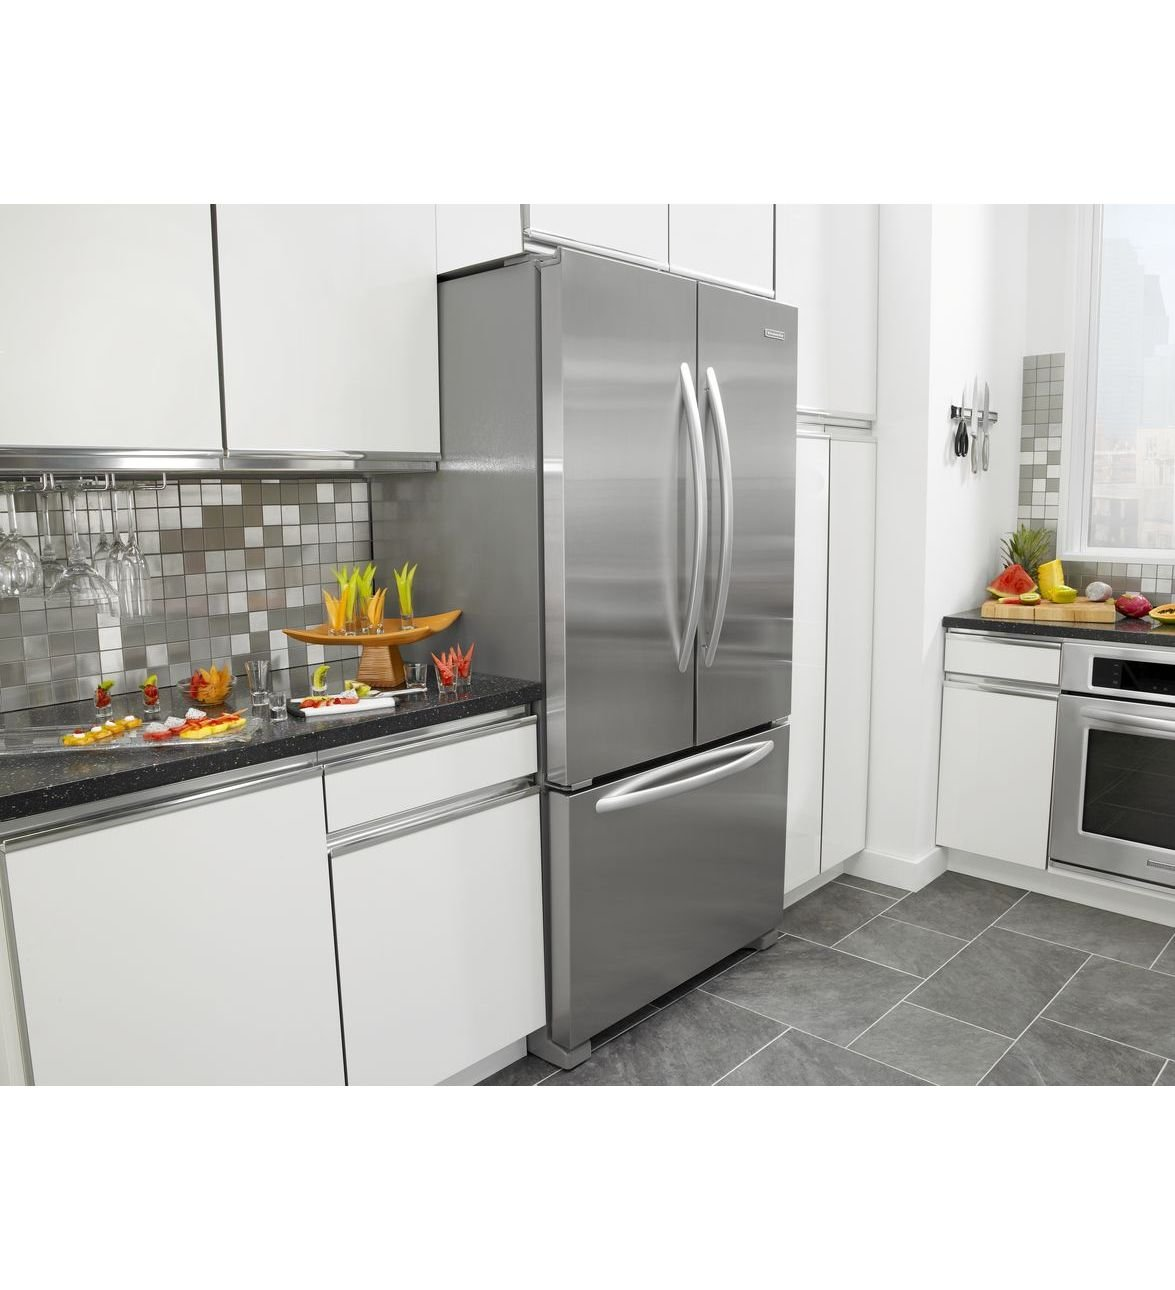 Amazon.com: KITCHENAID FRENCH DOOR FRIDGE *BRAND SOURCE ONLY*: Appliances